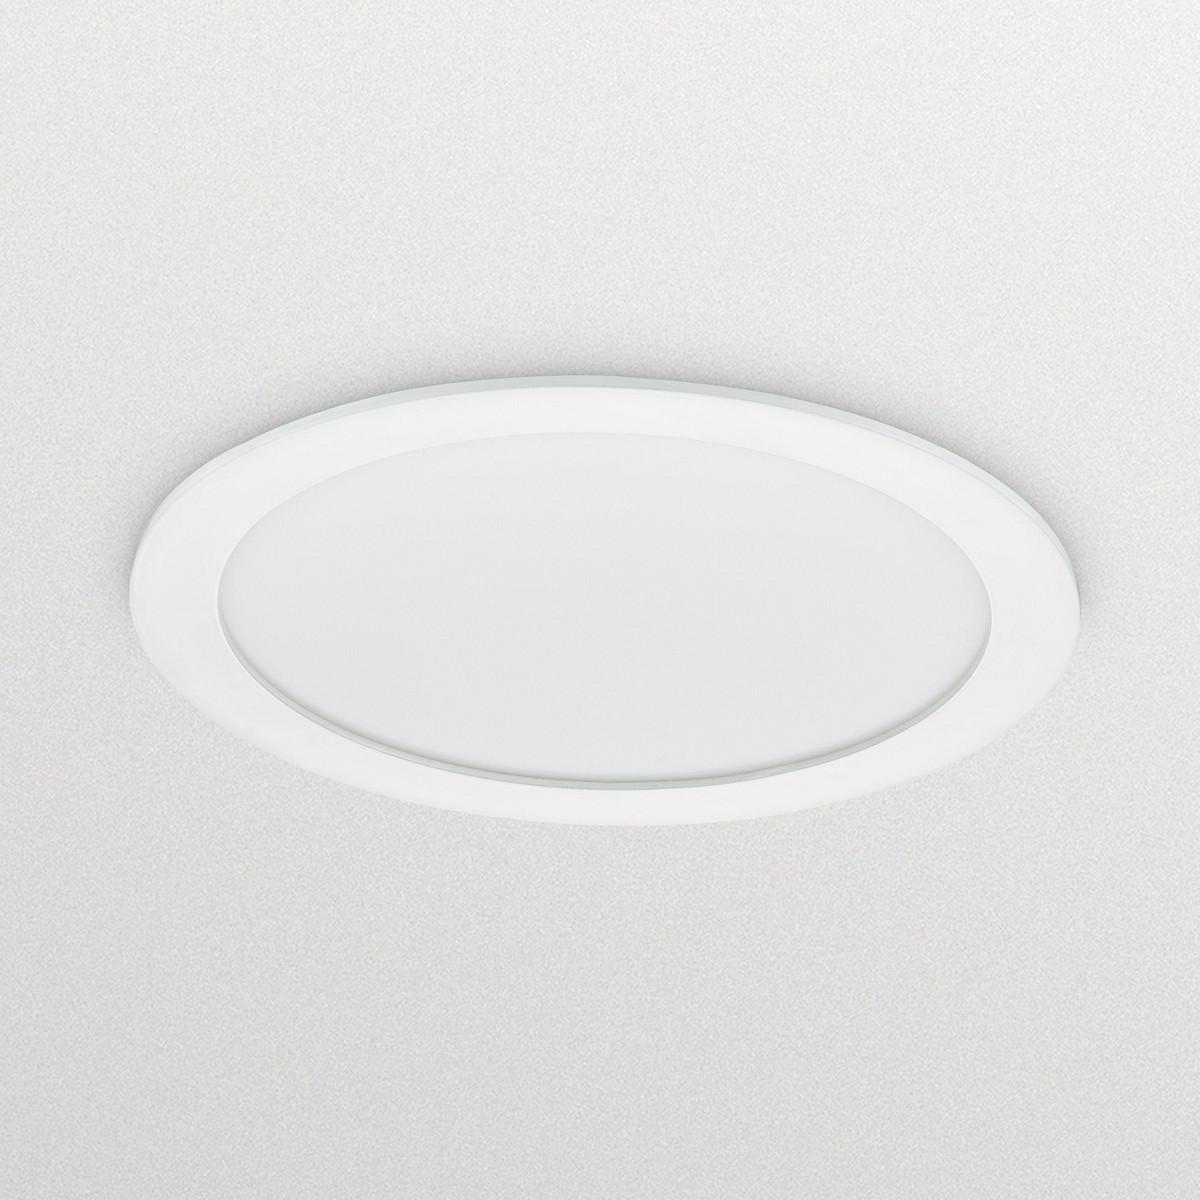 Philips CoreLine SlimDownlight Gen3 Indbyg DN145B 2100lm/830 21W Hvid